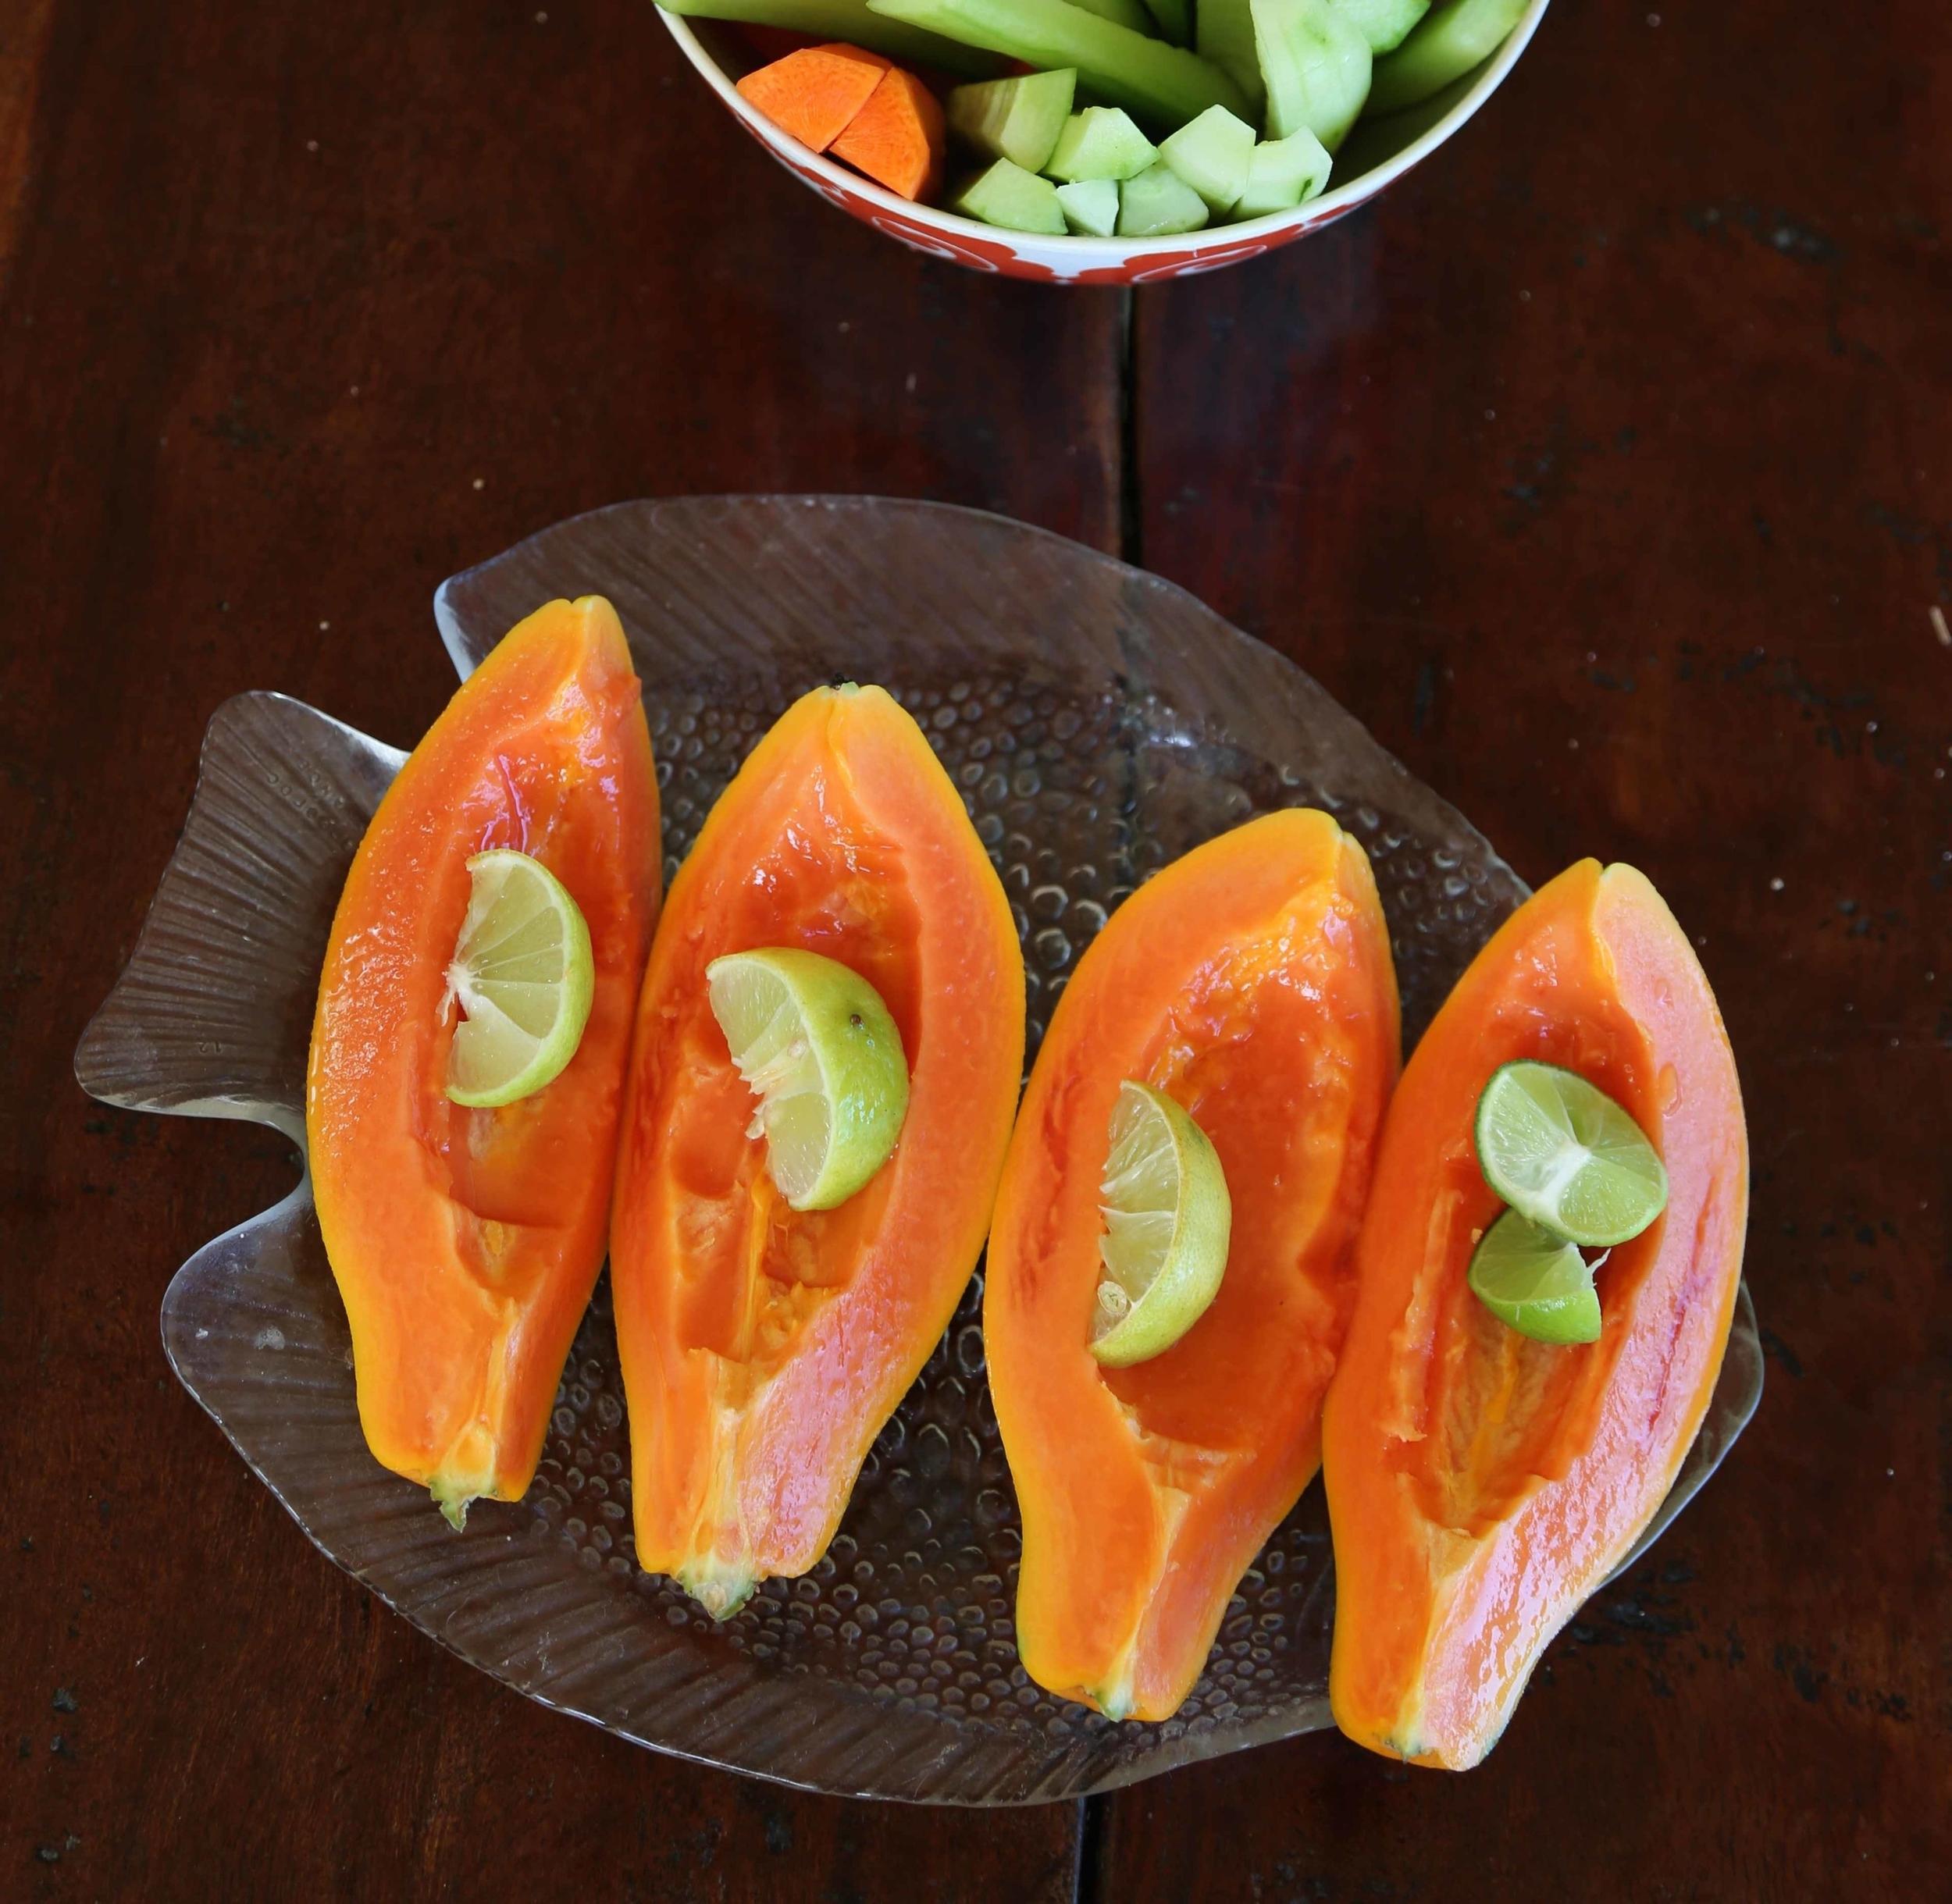 fruit&veggies copy.jpg